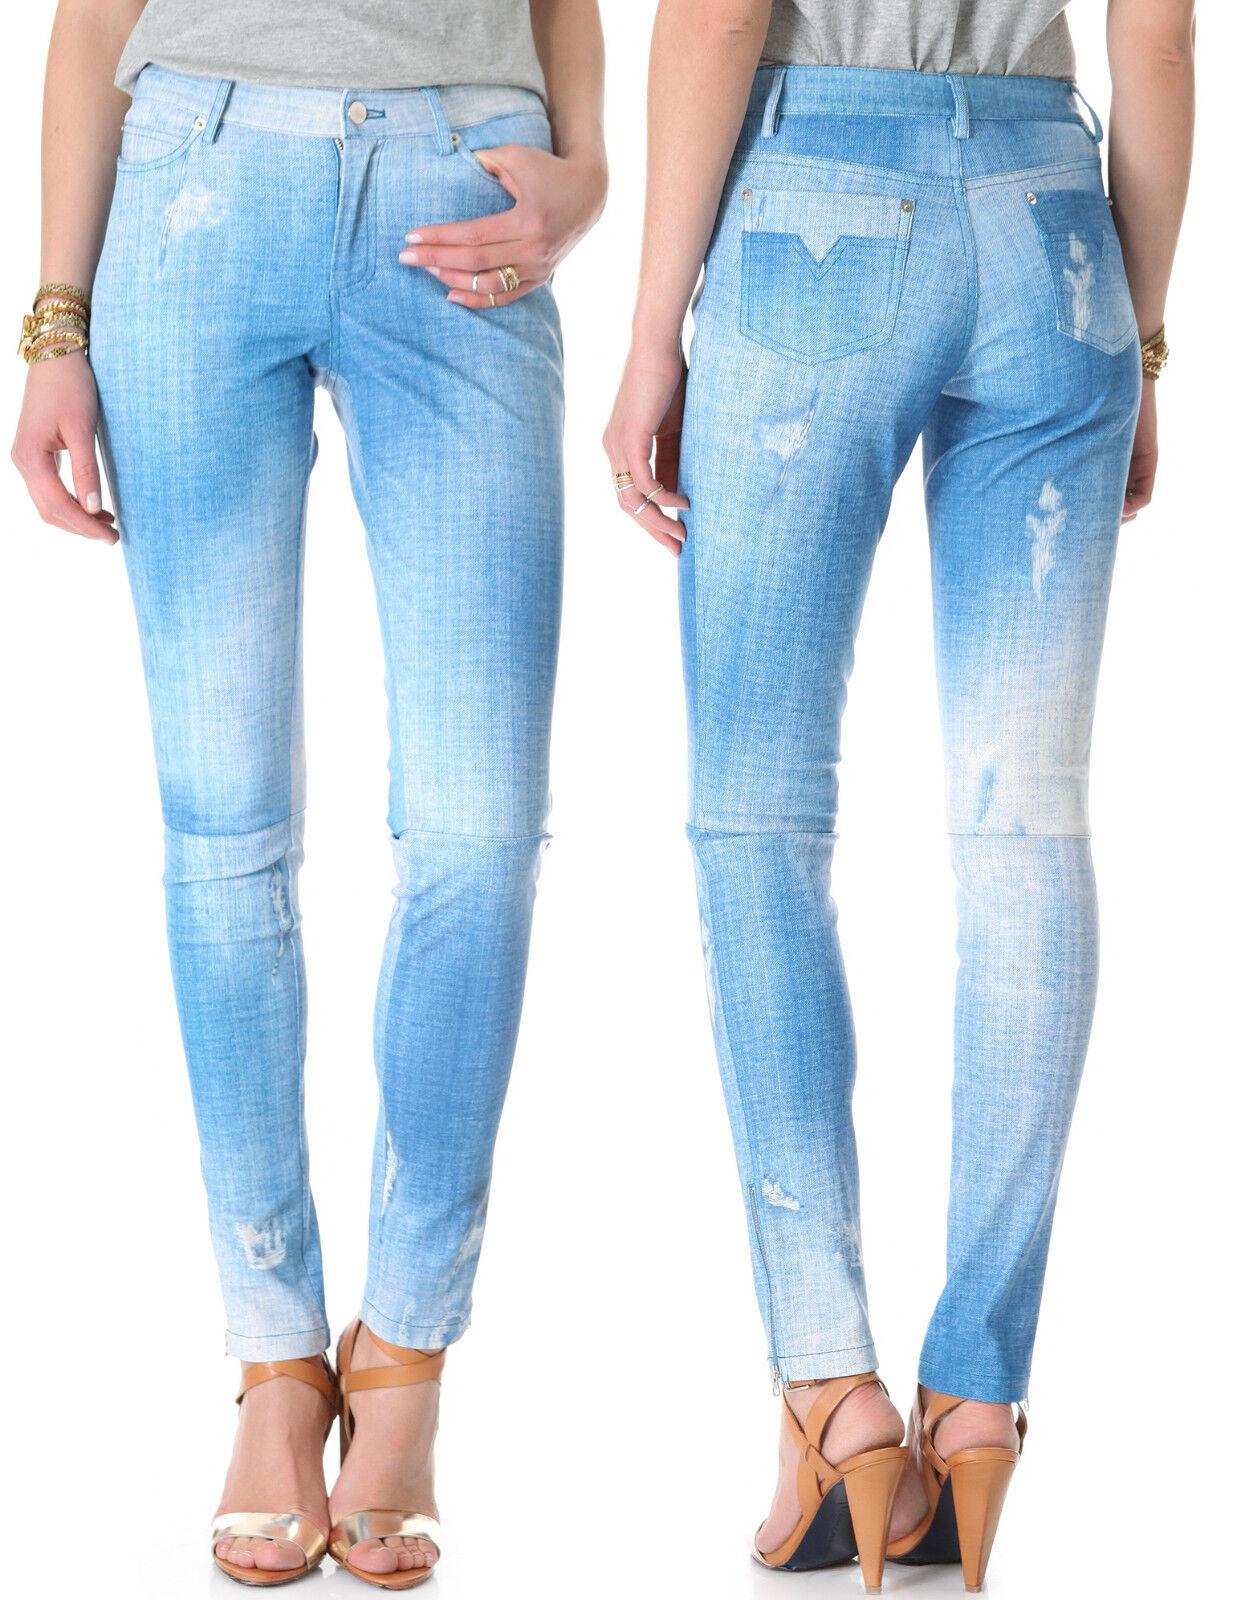 NWT  998 Rebecca Minkoff Denim Print Leather Skinny Pants Size 0